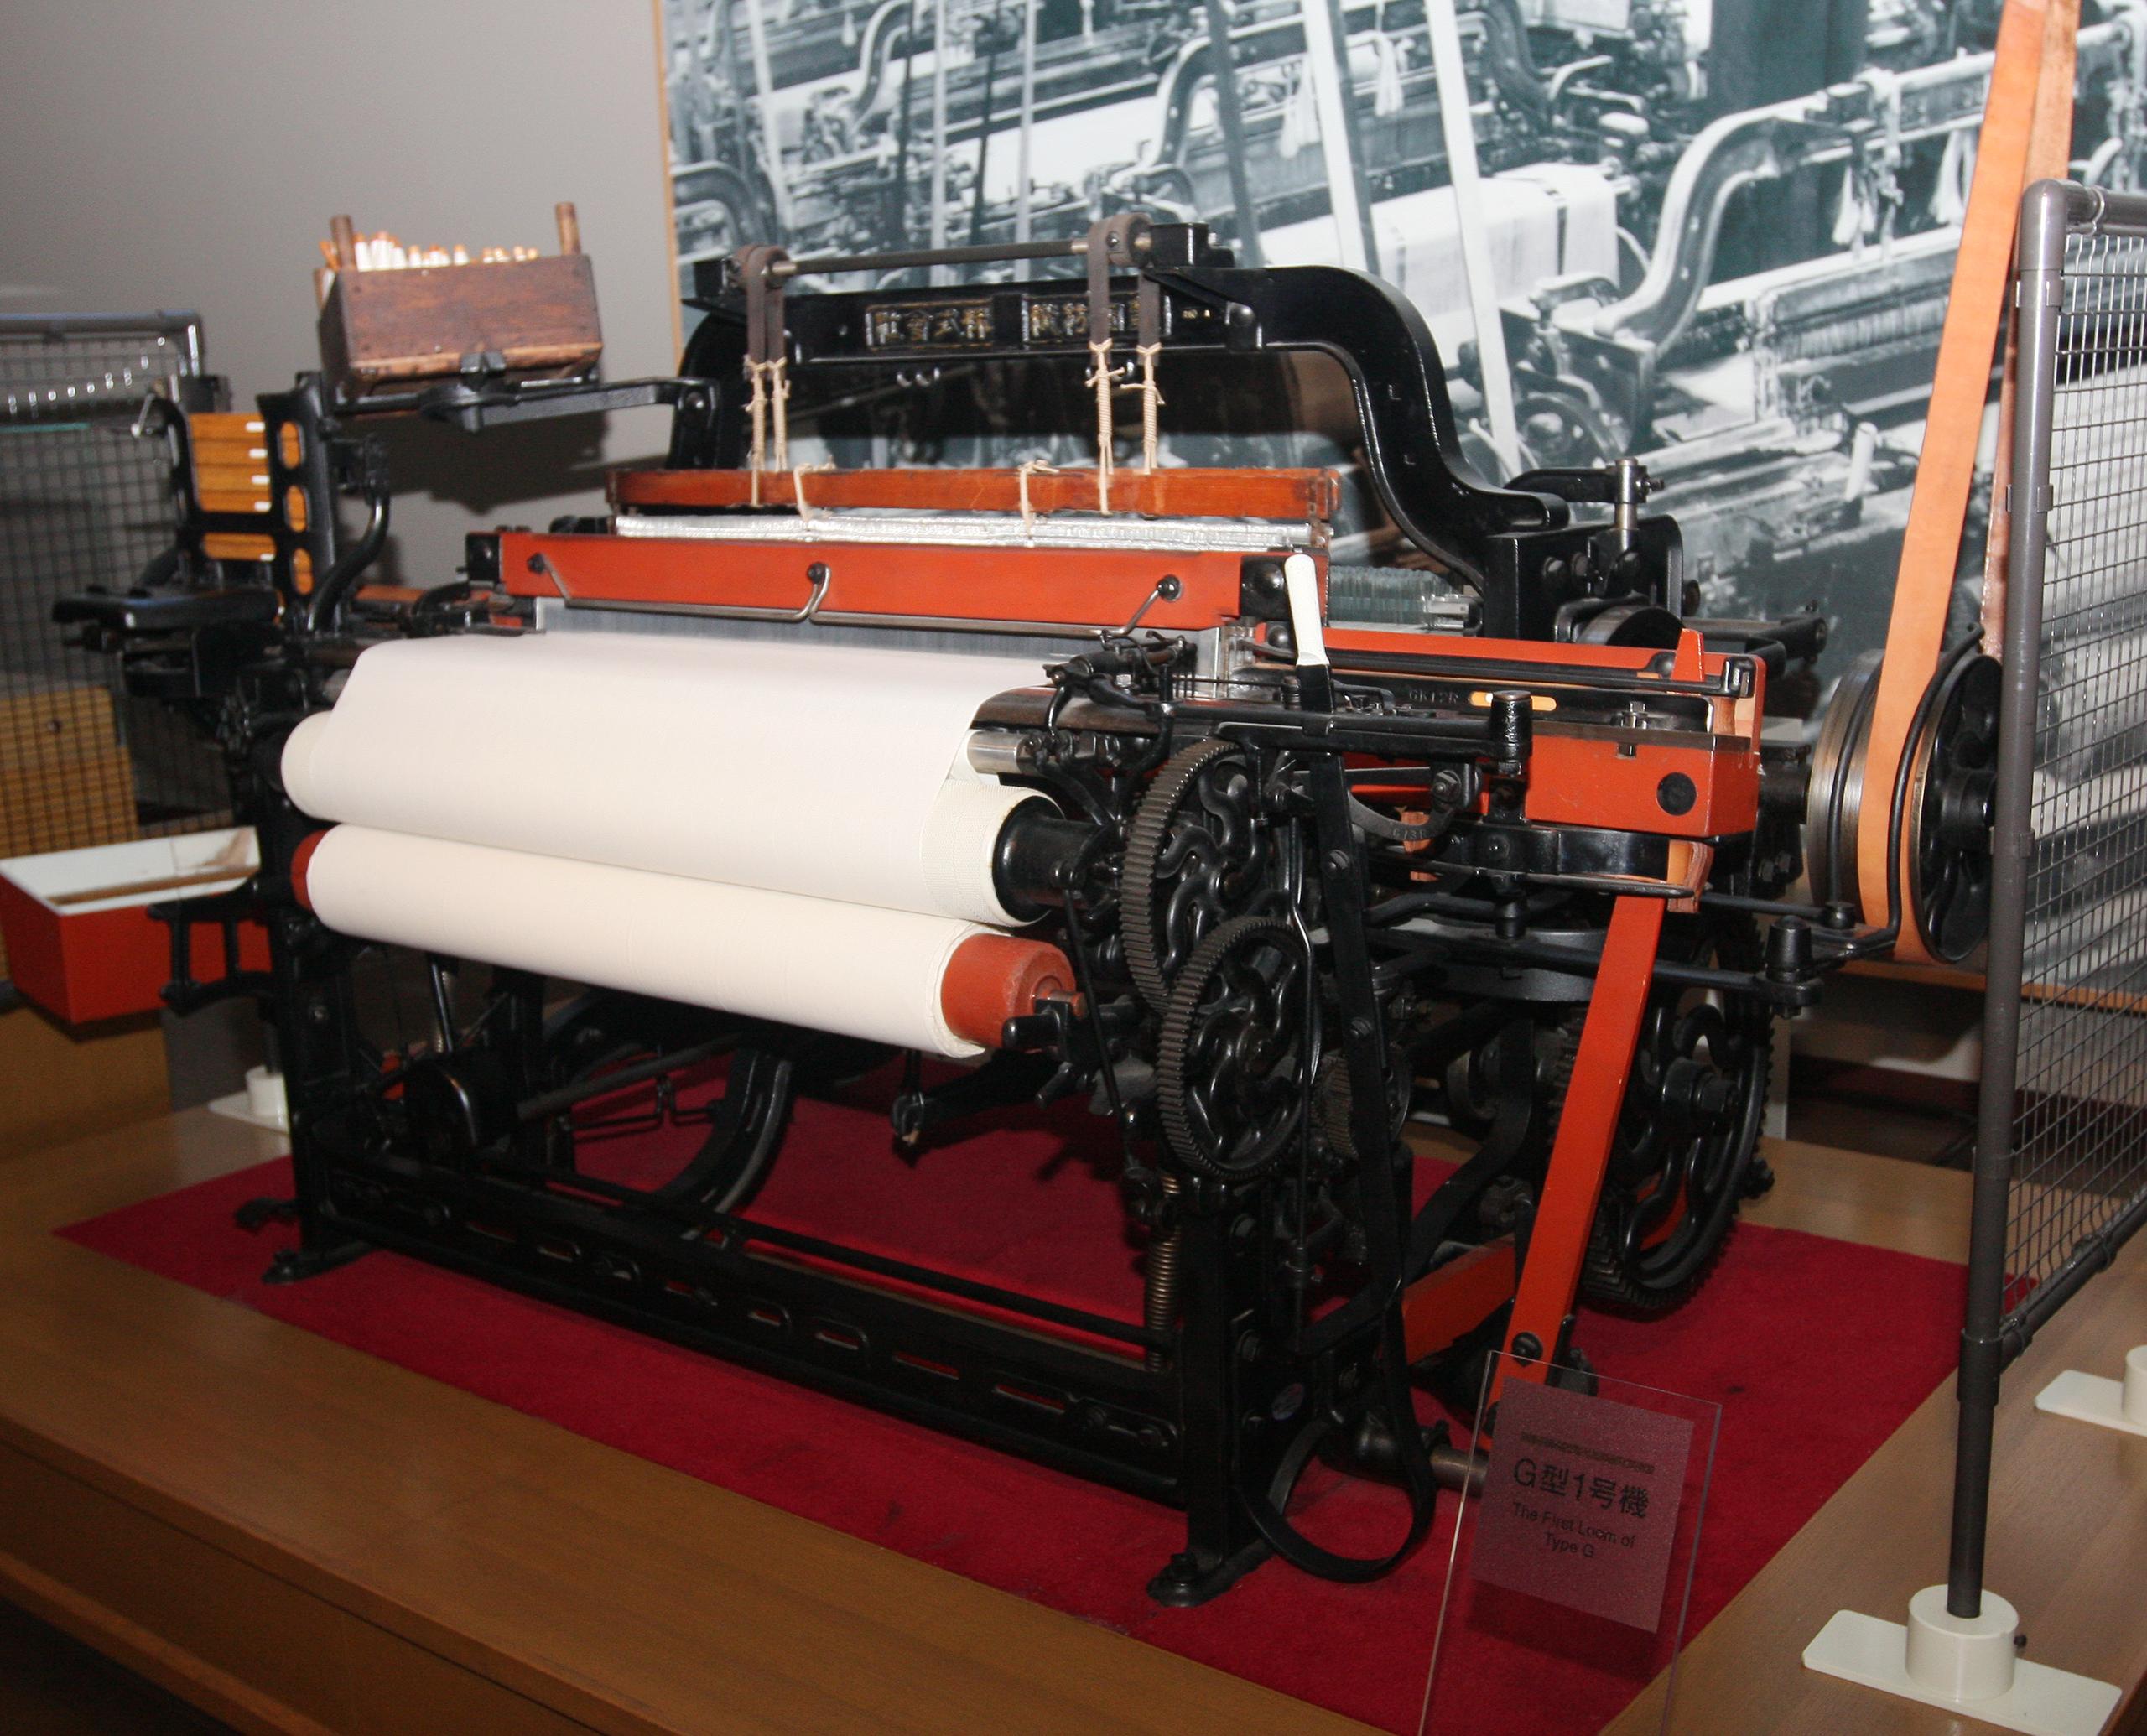 automatic loom